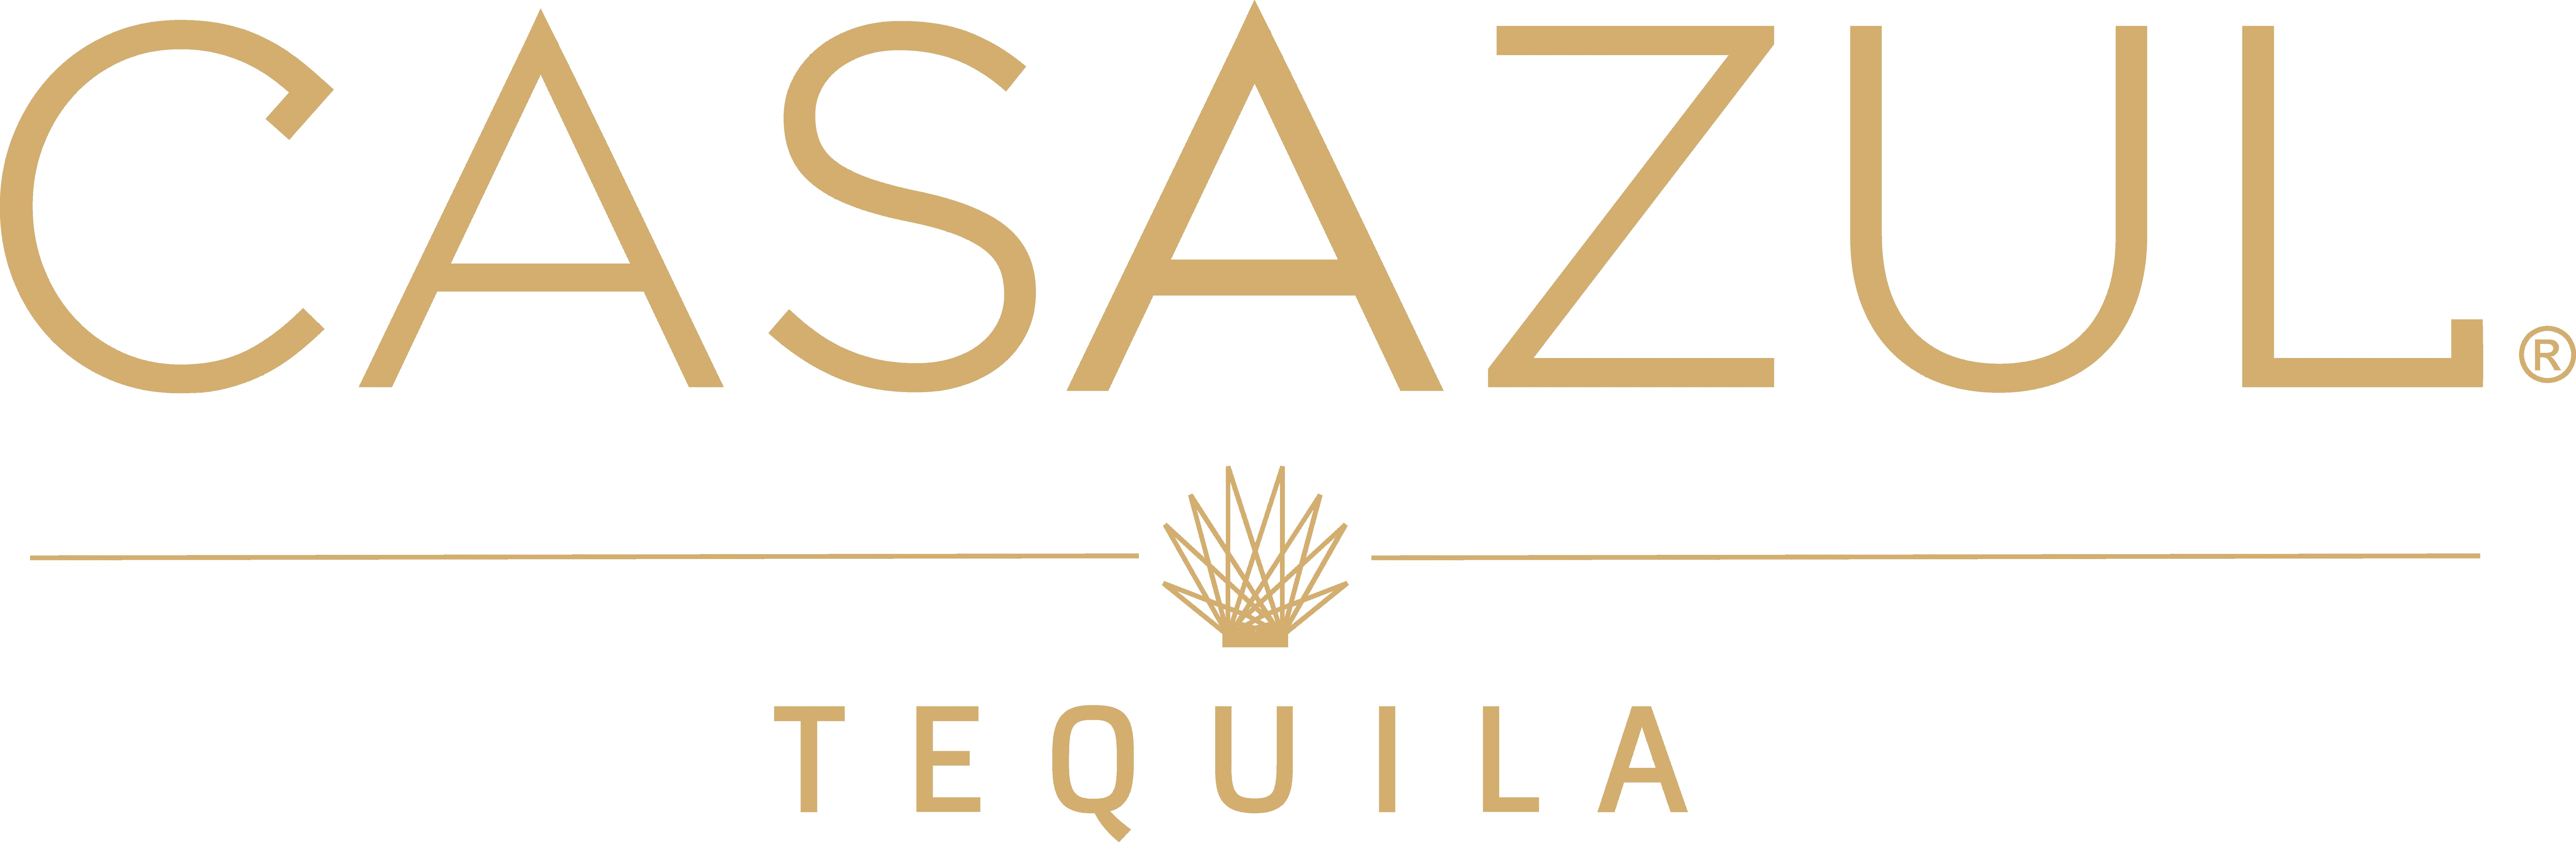 Tequila Casazul